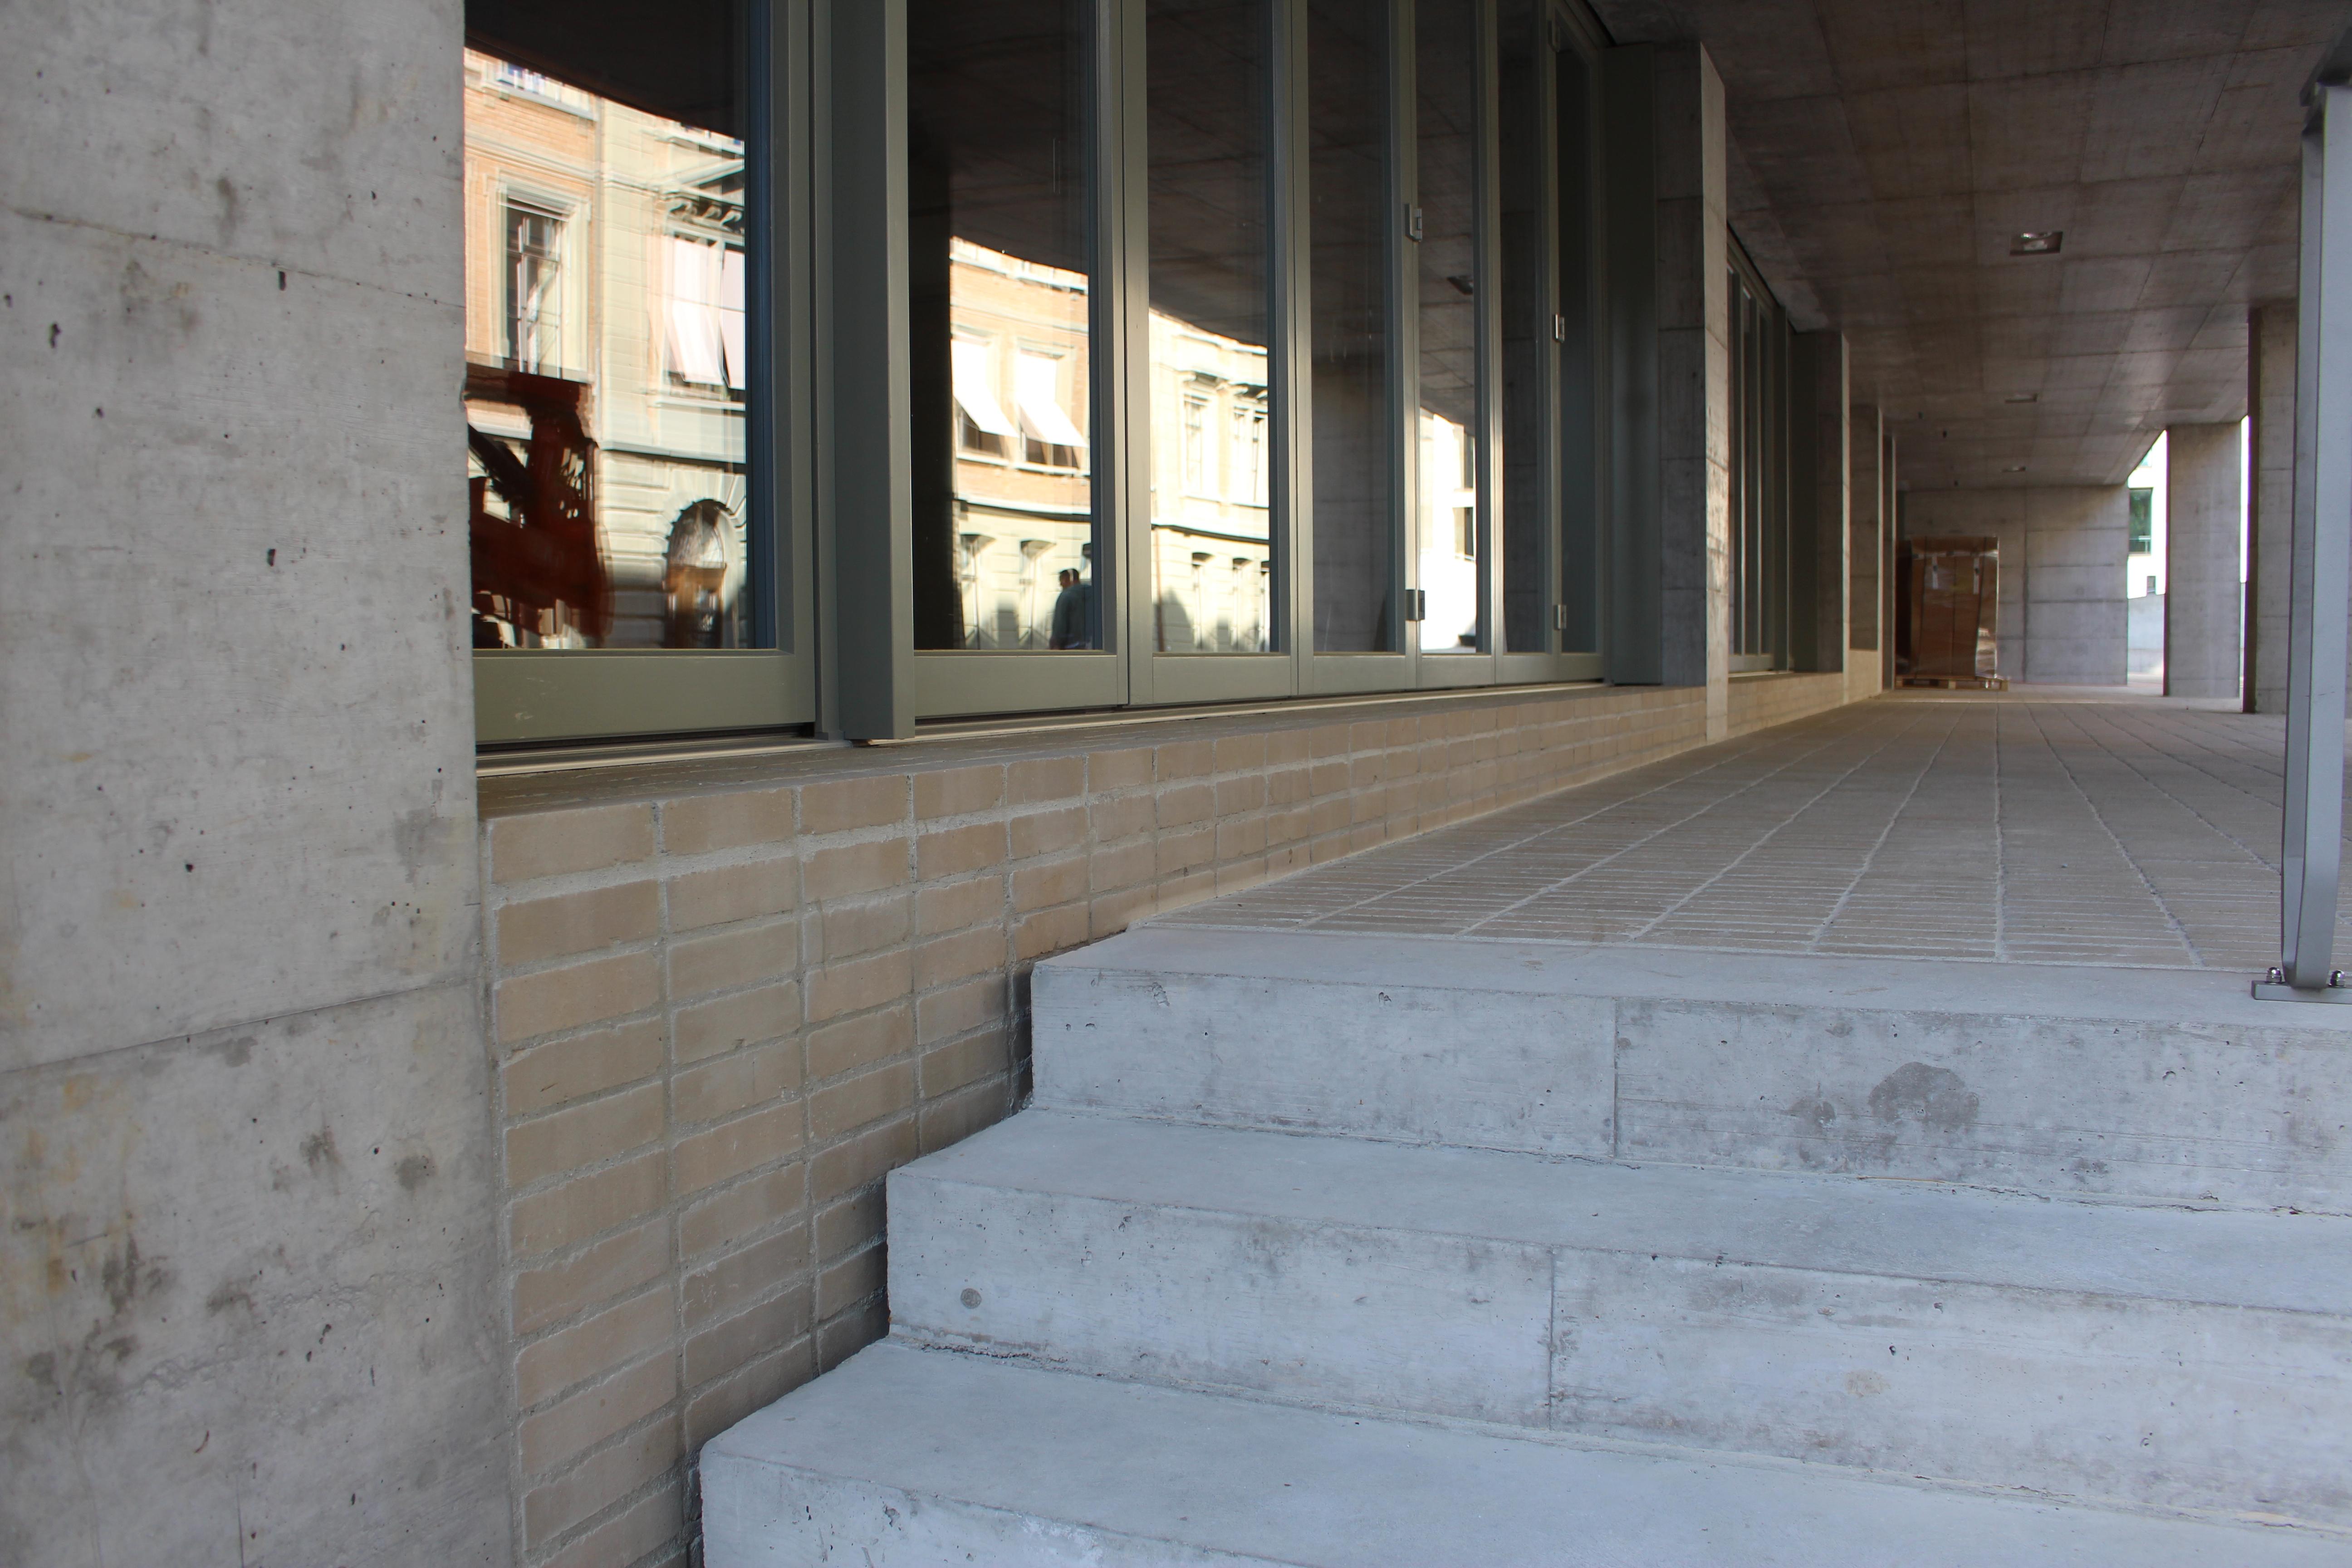 Primarschule St.Leonhard, St.Gallen